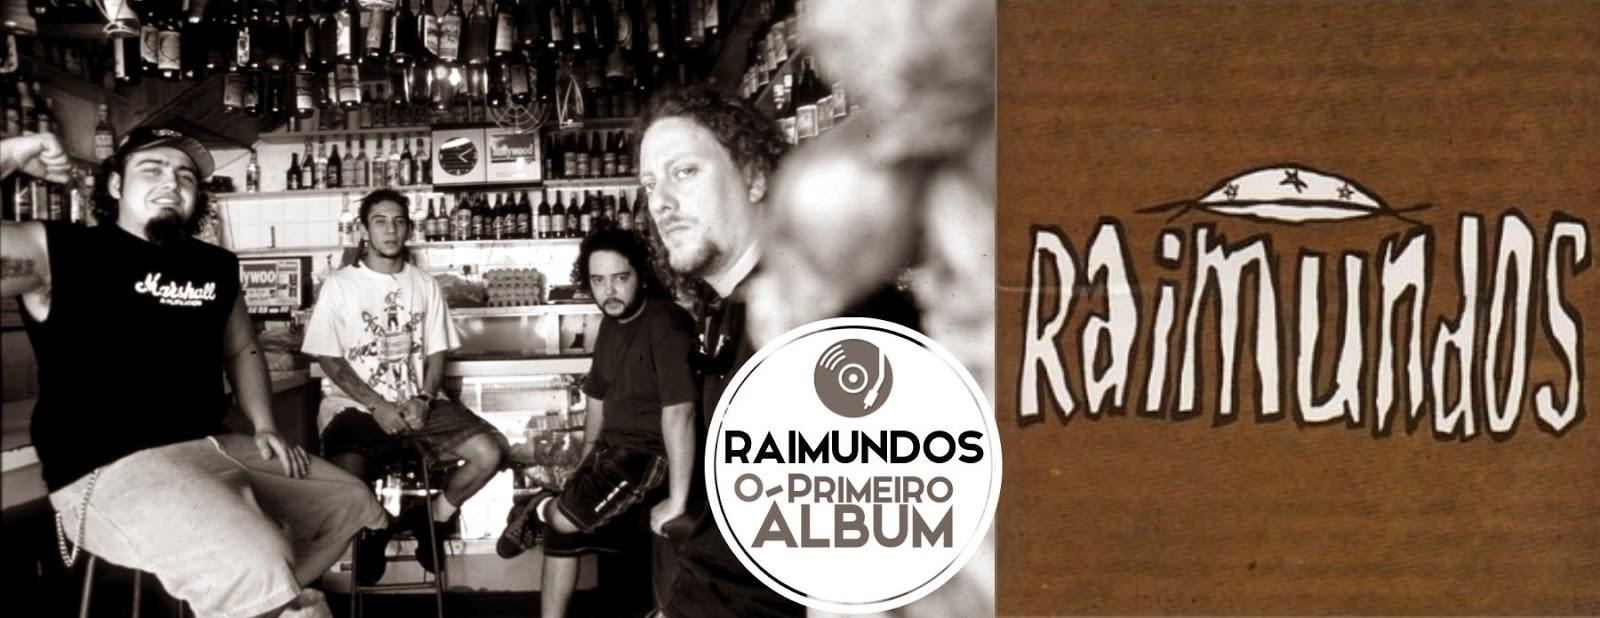 O 1º Álbum: Raimundos - Raimundos